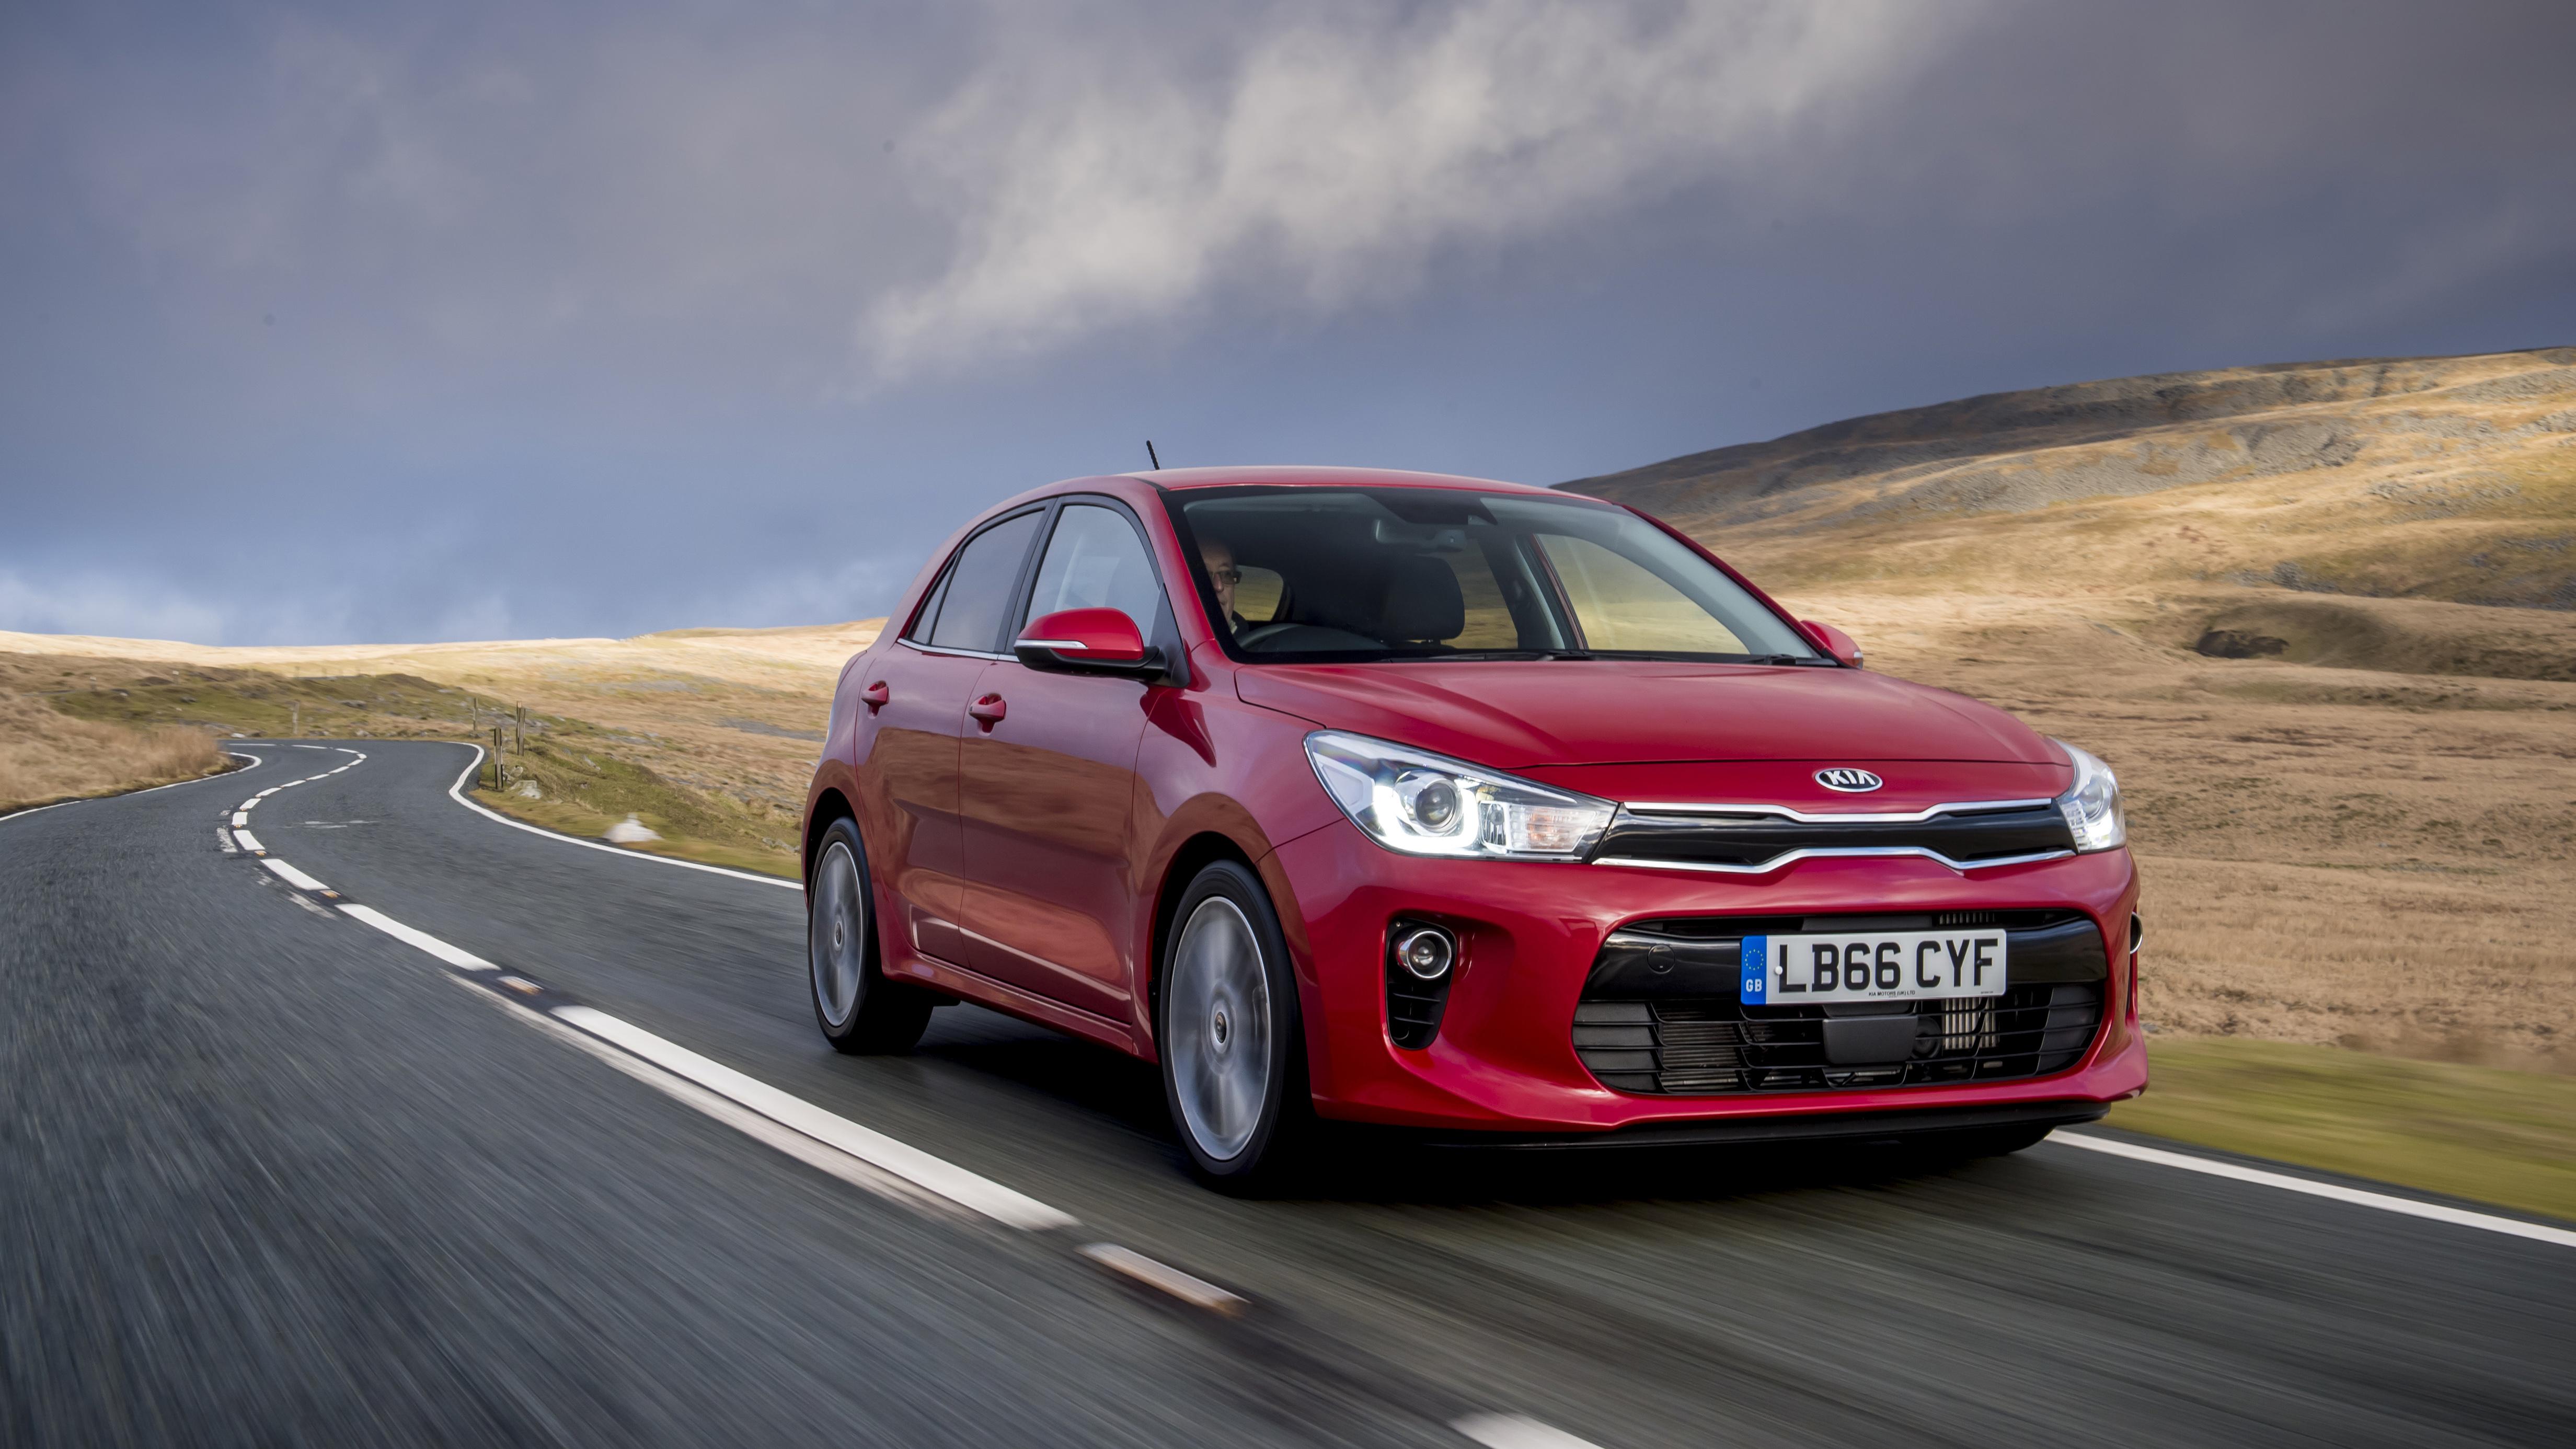 KIA RIO Hatchback Car Deals with Cheap Finance | BuyaCar